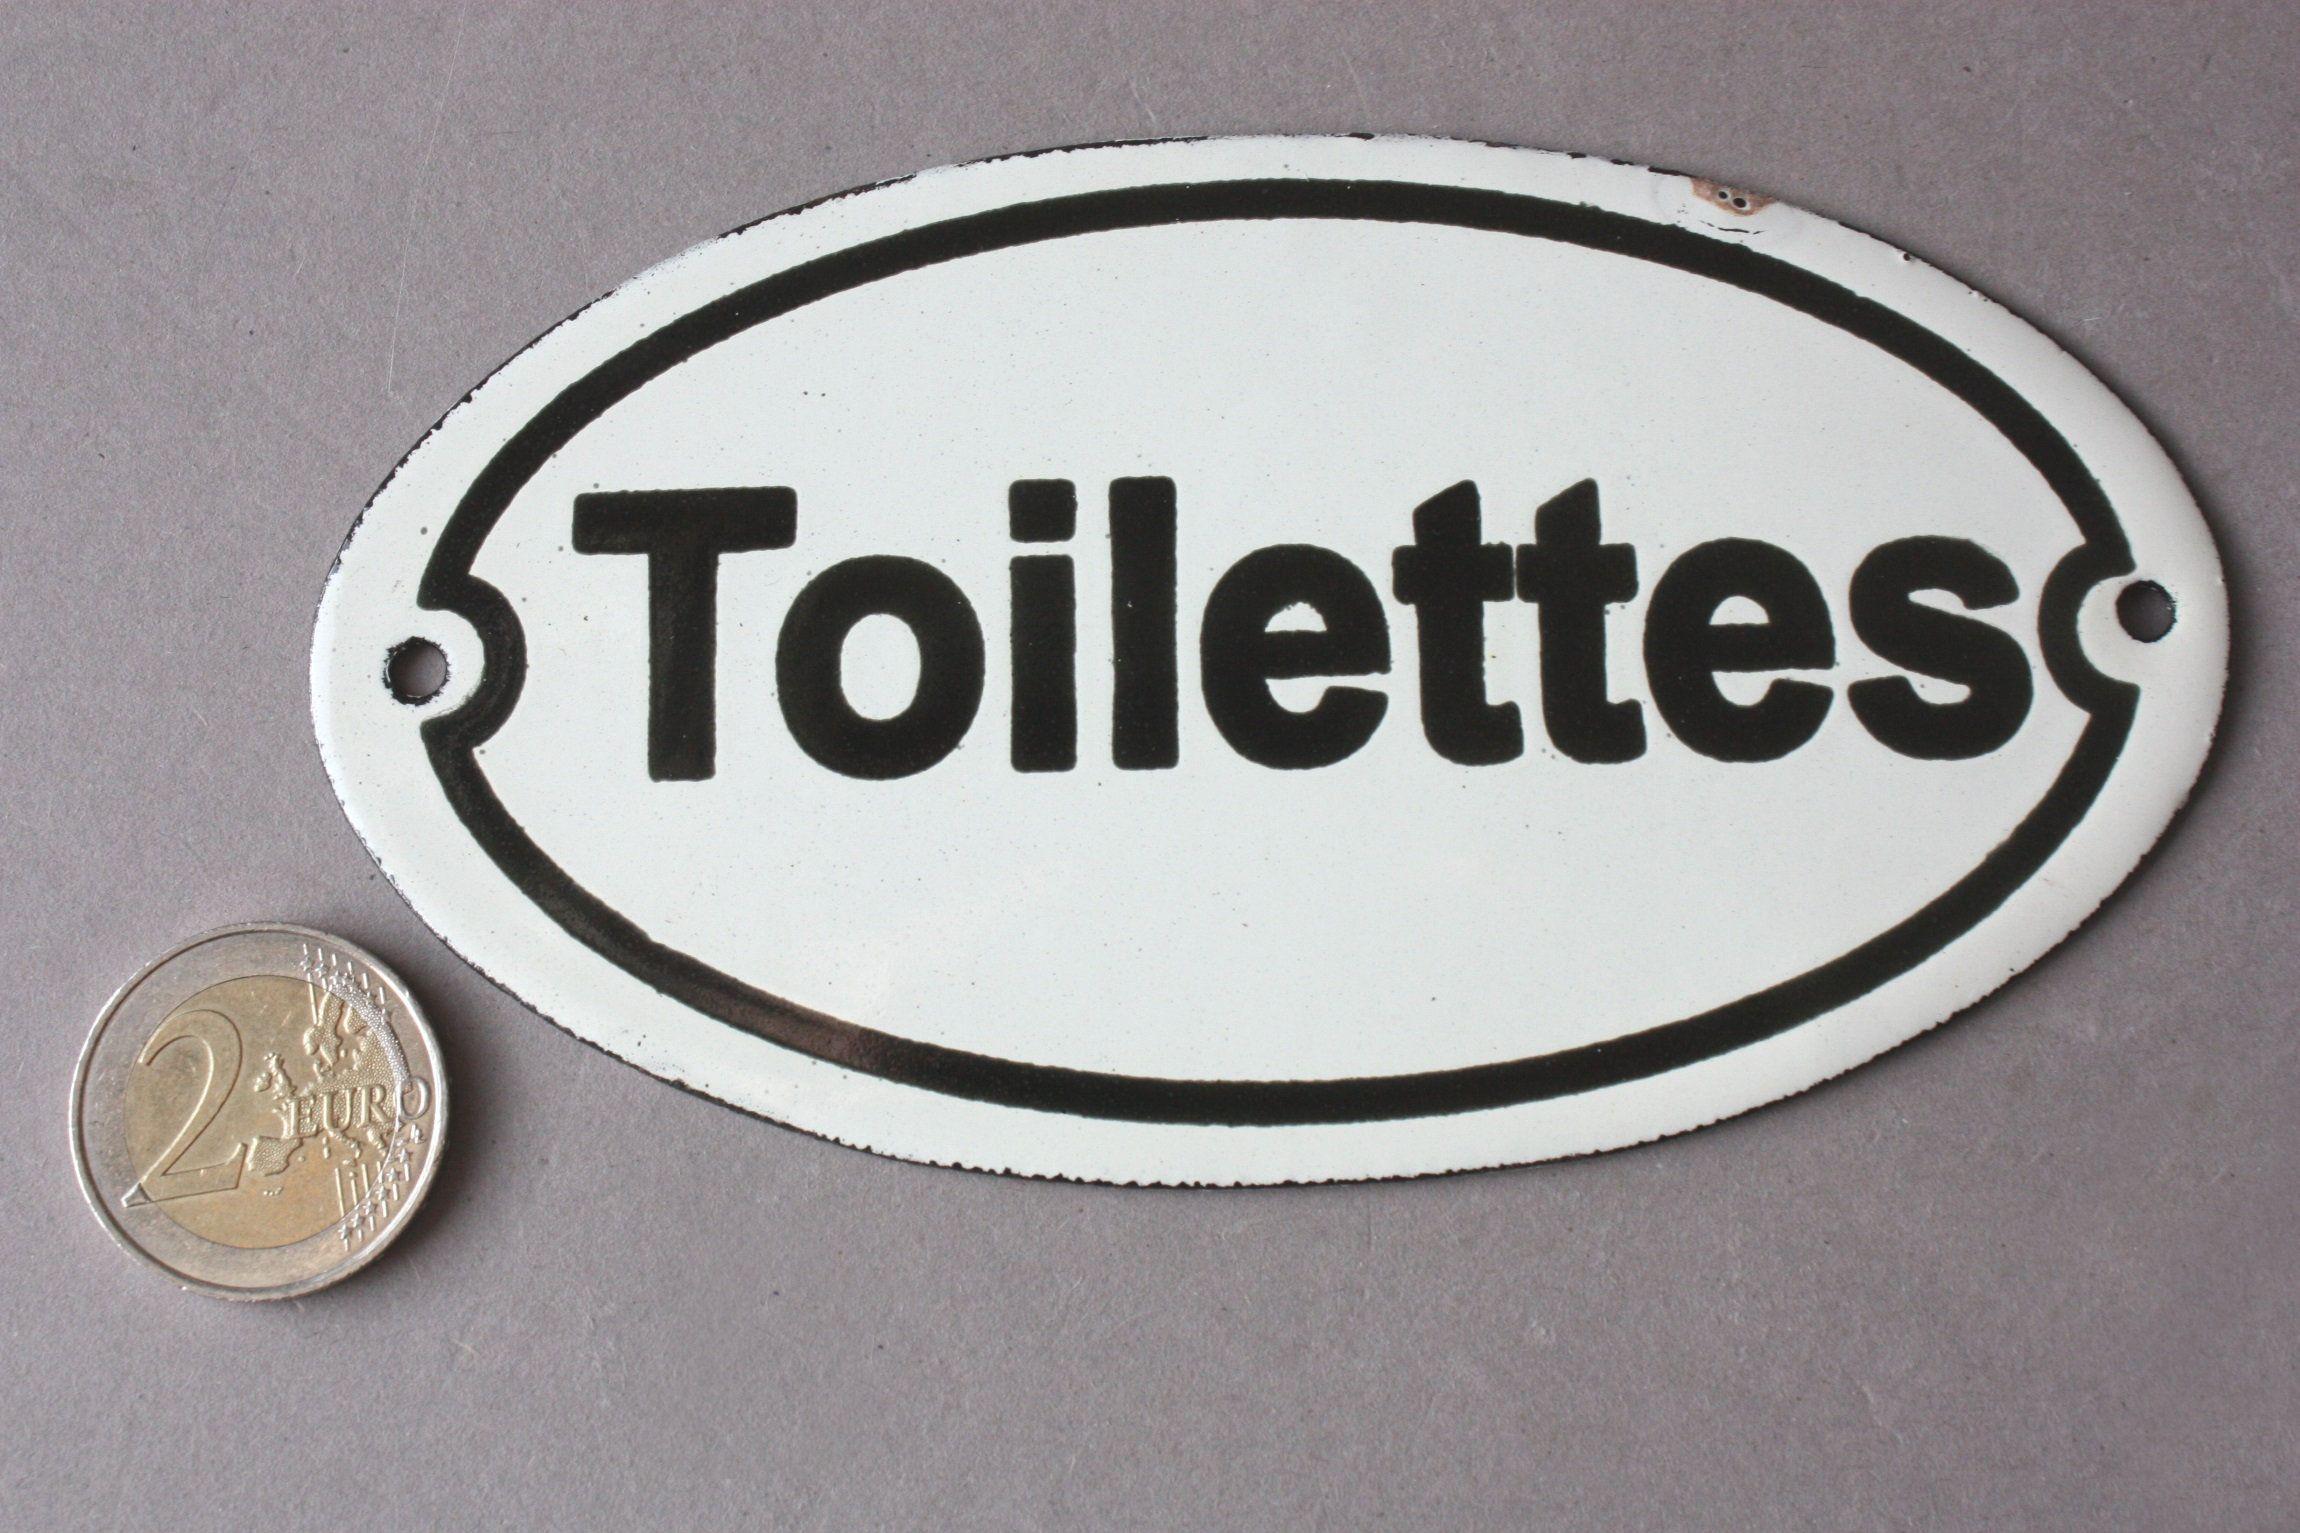 Toilettes Emaille Schild Shabby Emailleschild Toilette Vintage